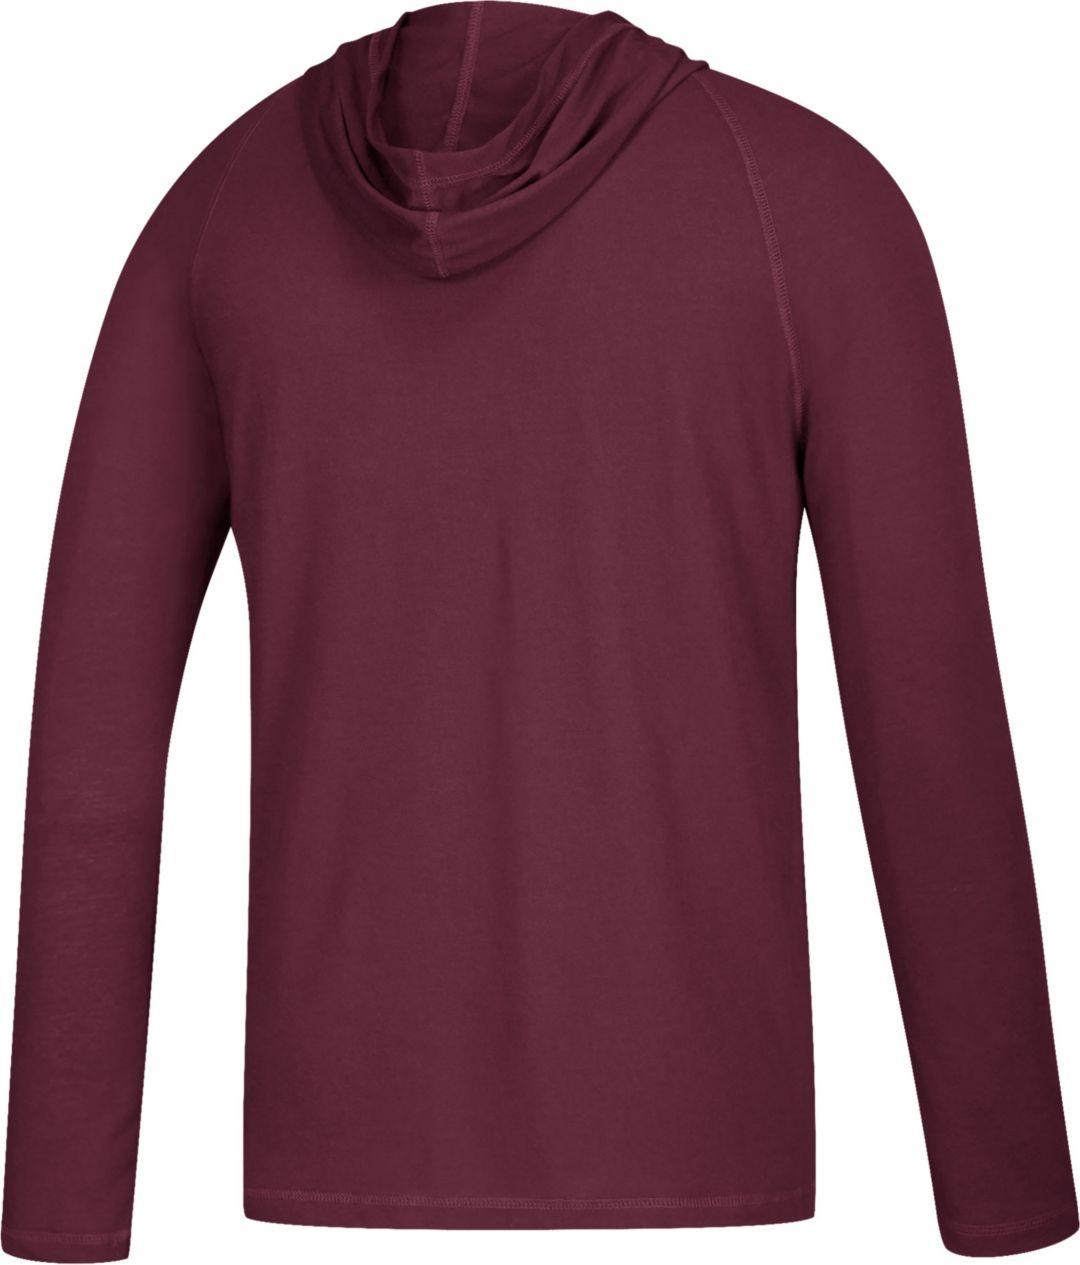 b90e6262c47c adidas Men's Arizona State Sun Devils Maroon 'PT42' Ultimate Long Sleeve  Hooded Shirt 2